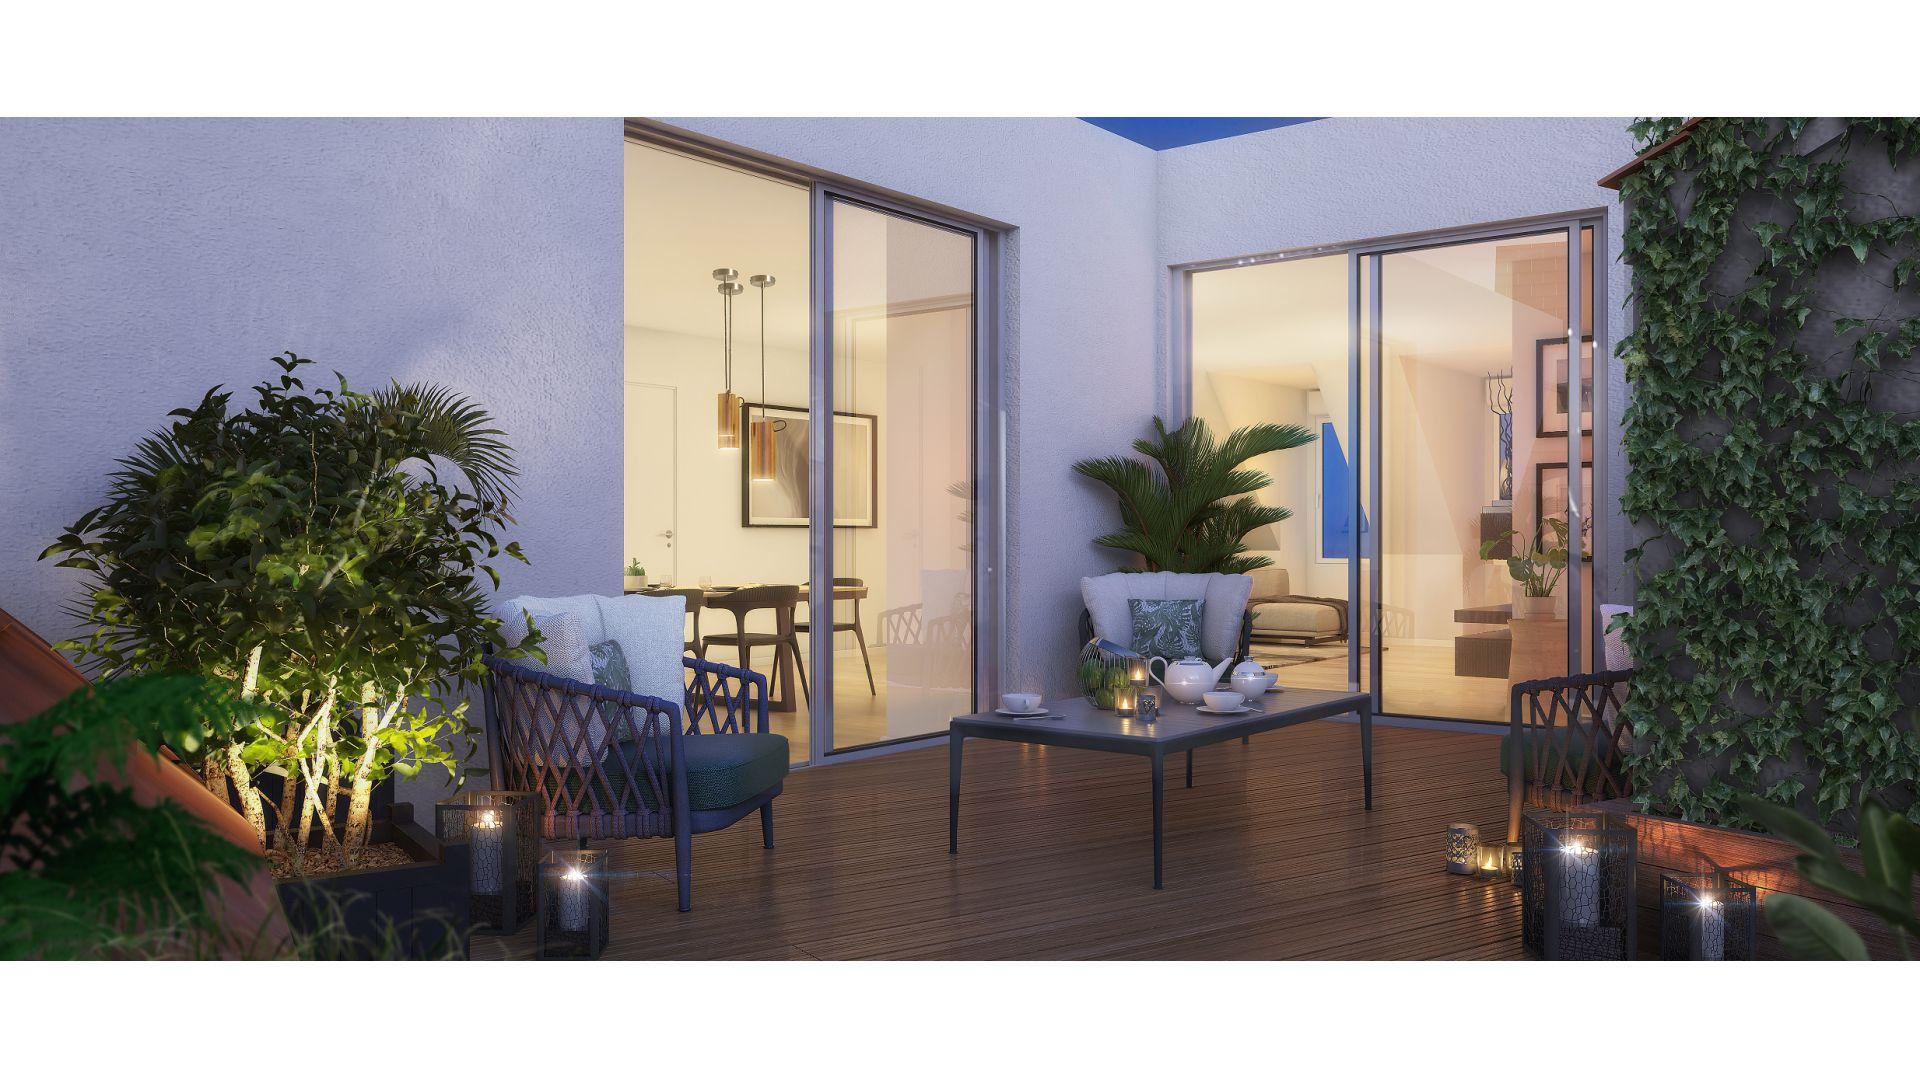 GreenCity immobilier - achat appartement  neuf - Villemomble - 93250 - Villa Castille - vue terrasse